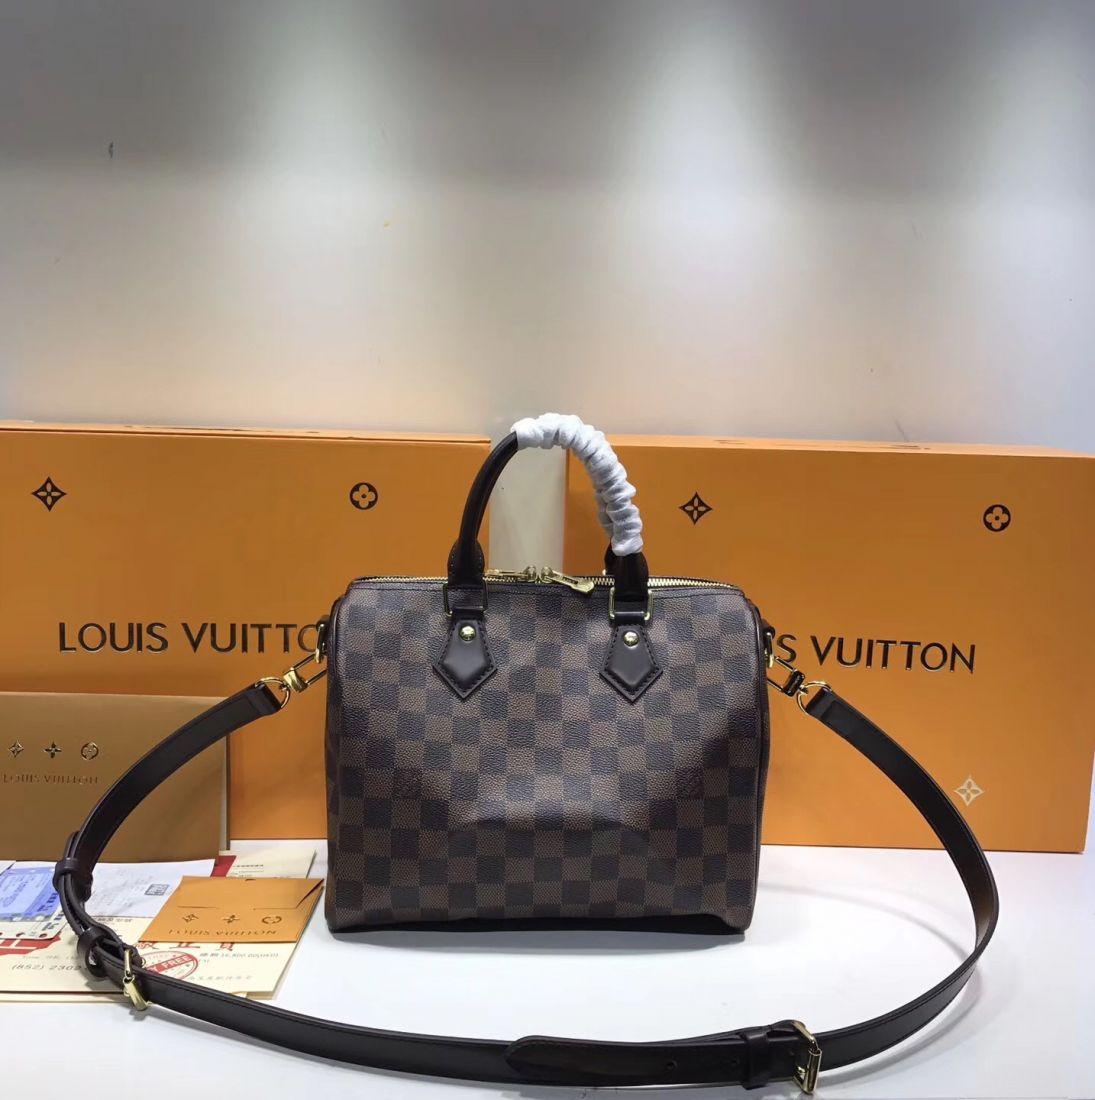 Сумка Louis Vuitton Speedy 25 Damier Ebene Canvas